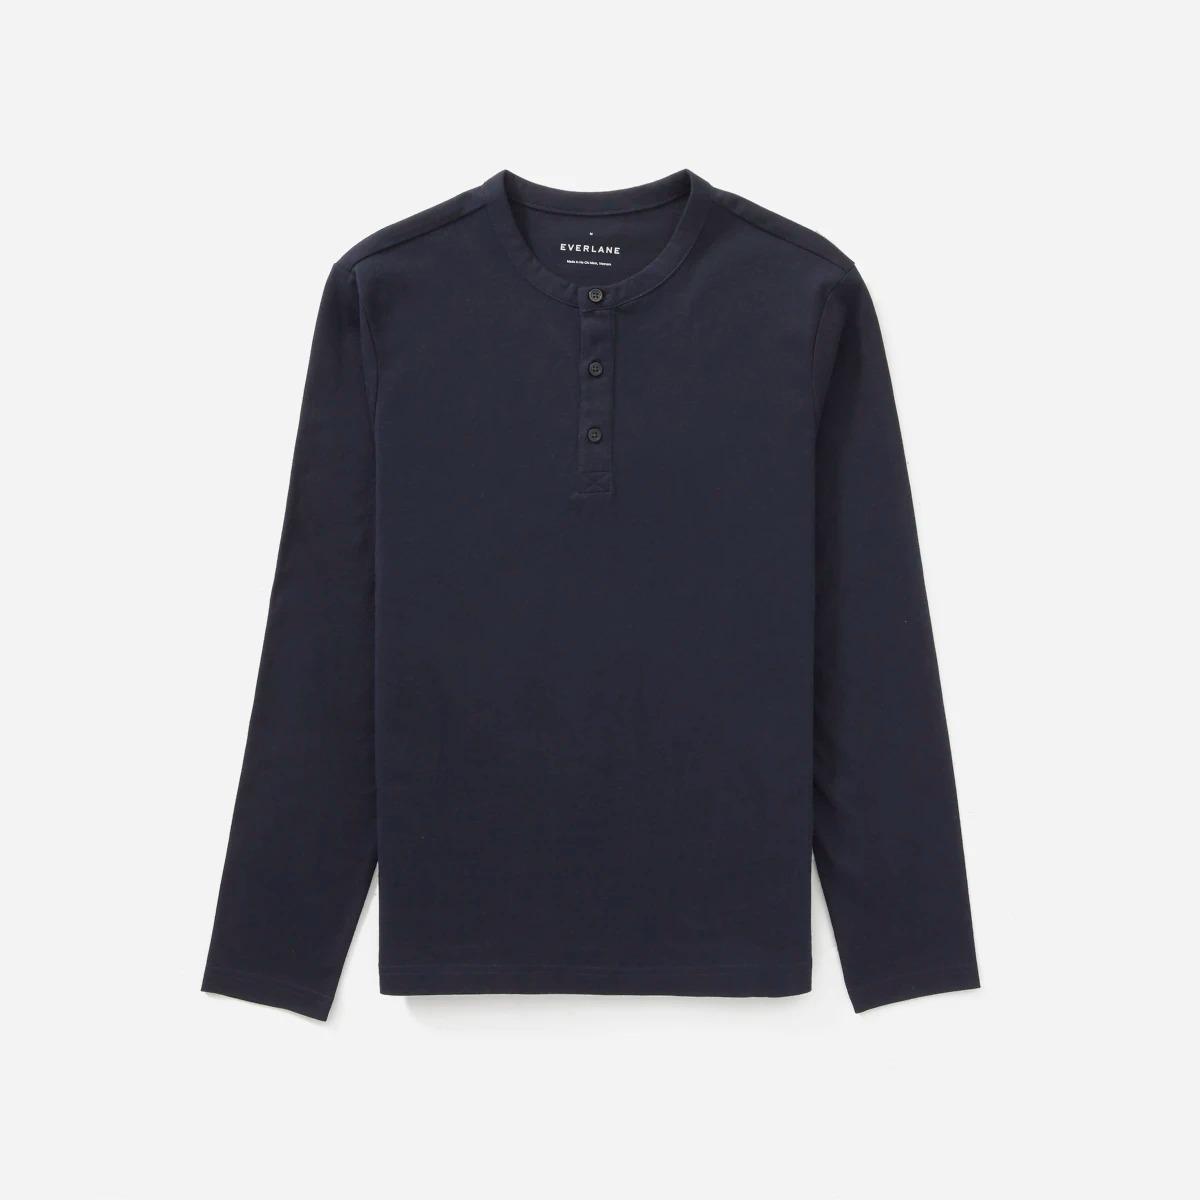 best Henley shirts for men: Everlane premium weight henley shirt